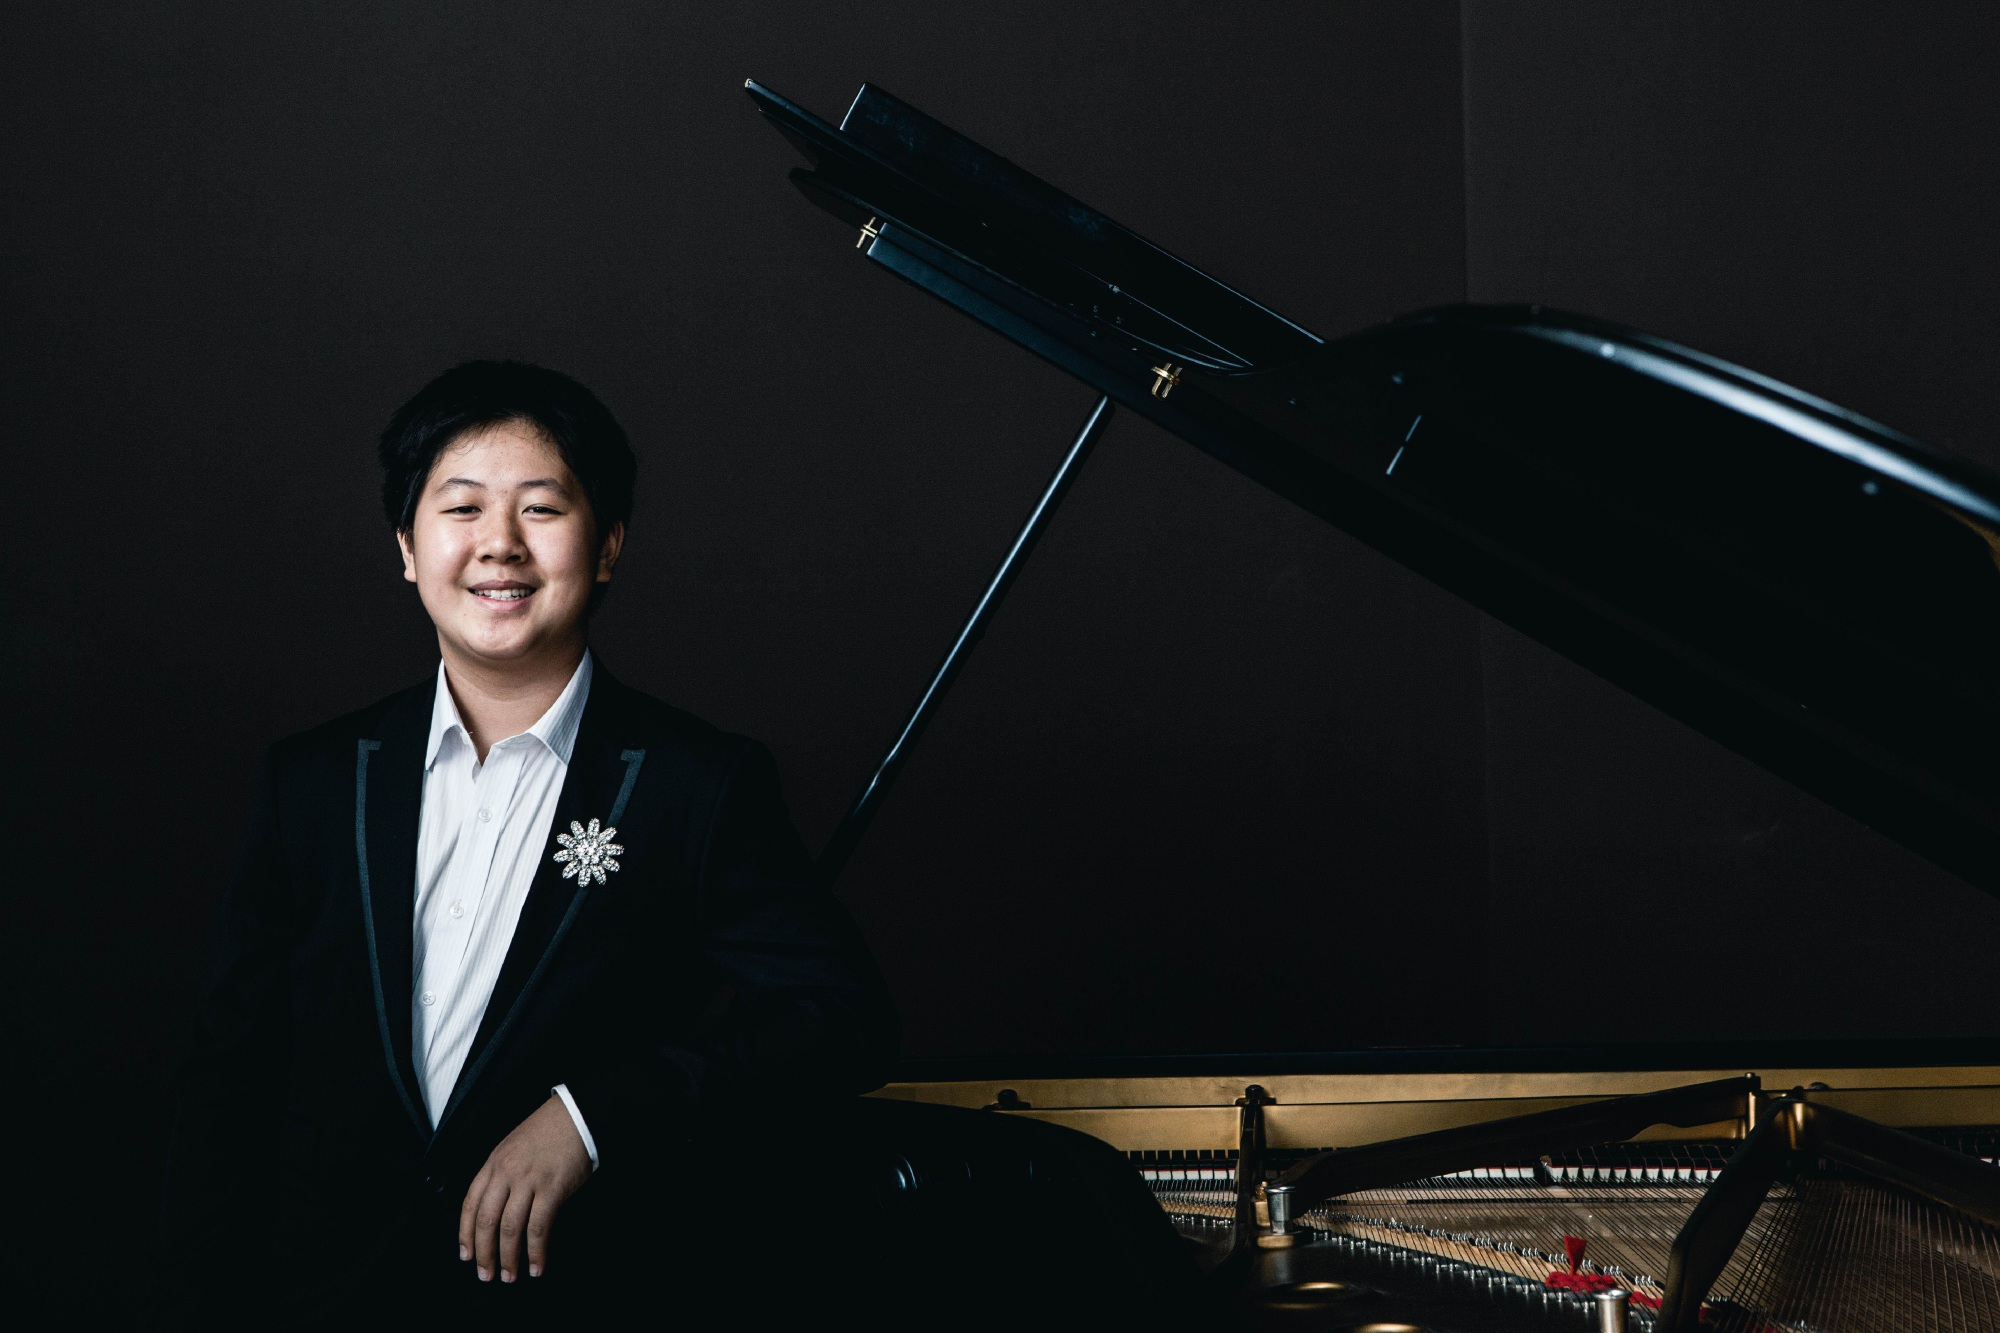 Shuan Hern Lee